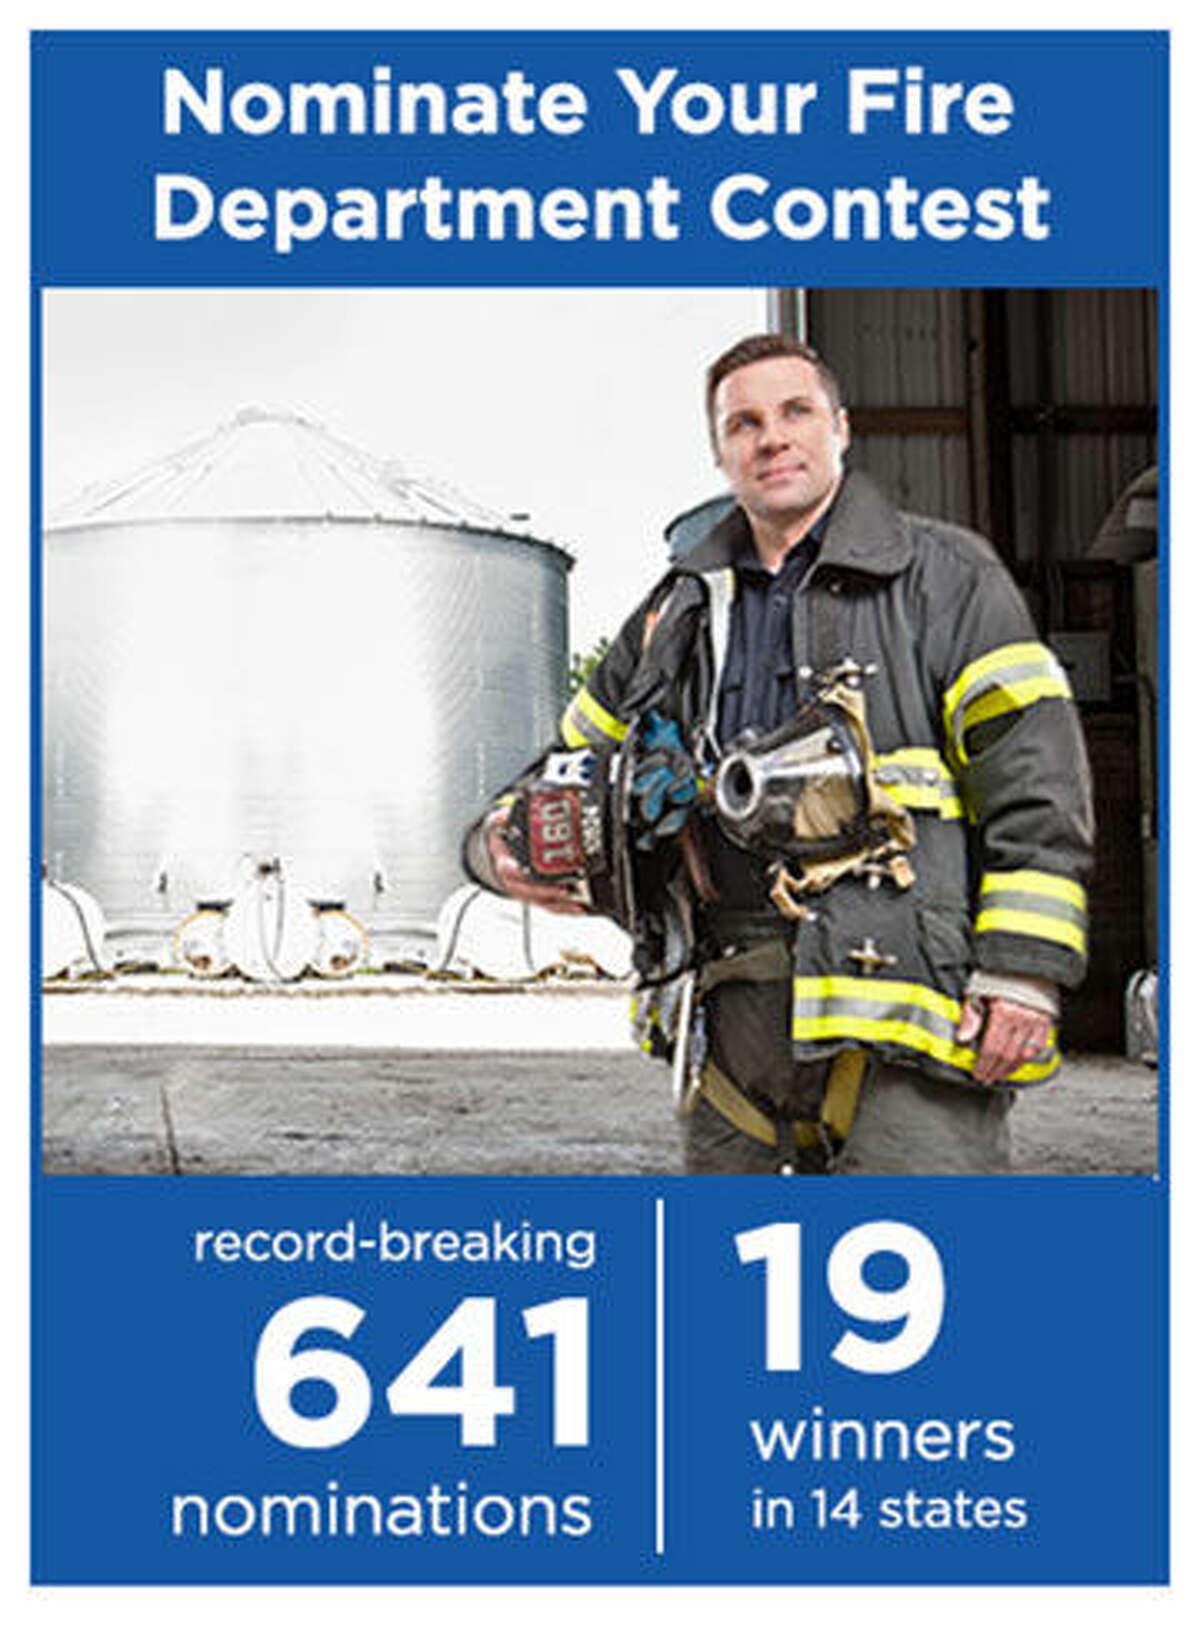 Grain Bin Safety Week Awards First Responders